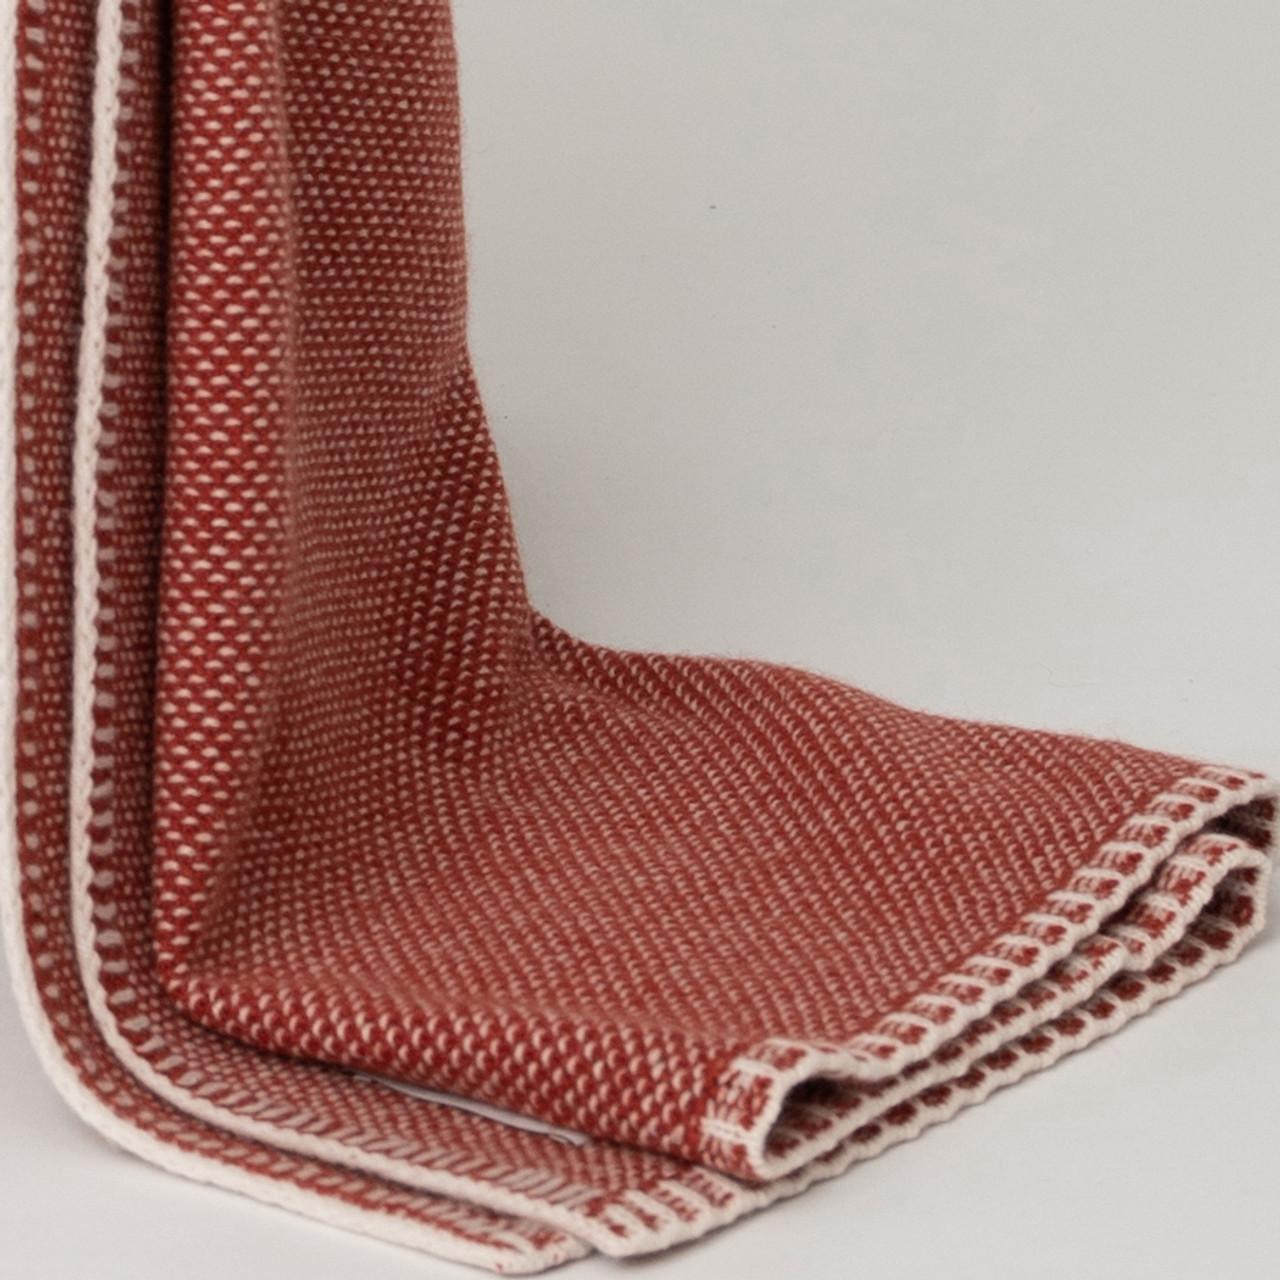 Rust Bird's Eye Knit Cashmere Throw